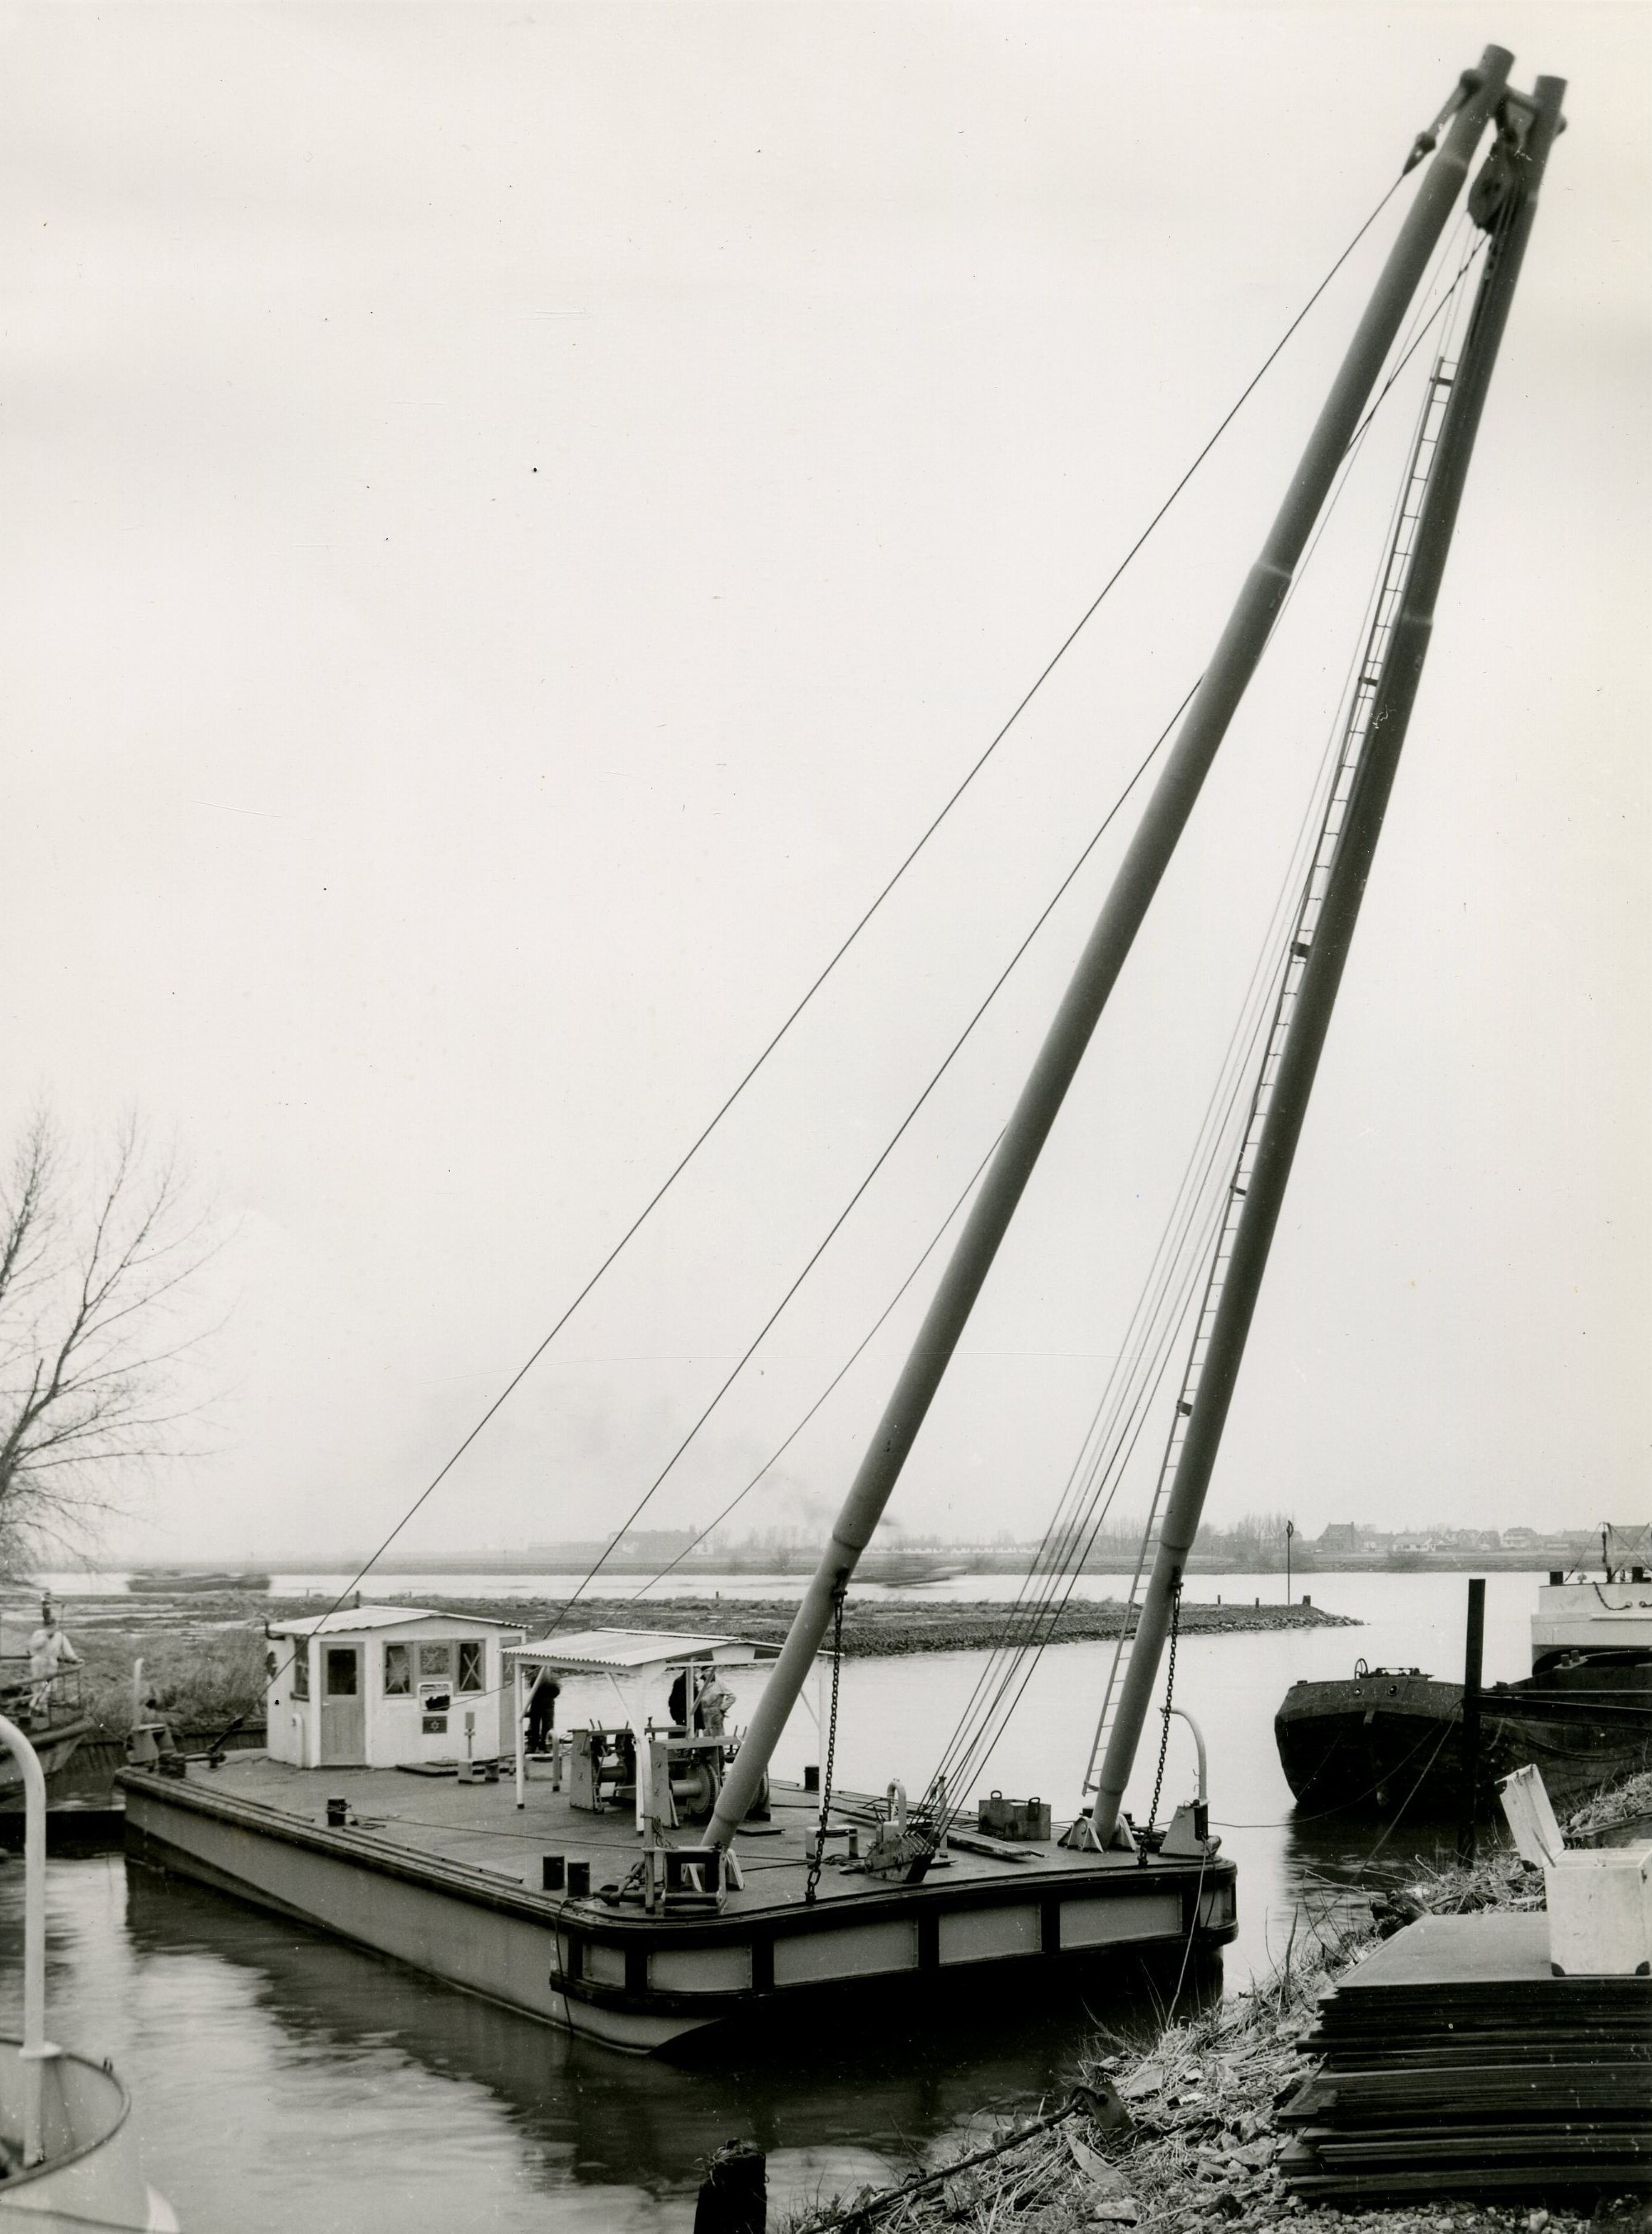 Bnr. 405 Mastbok (1960)